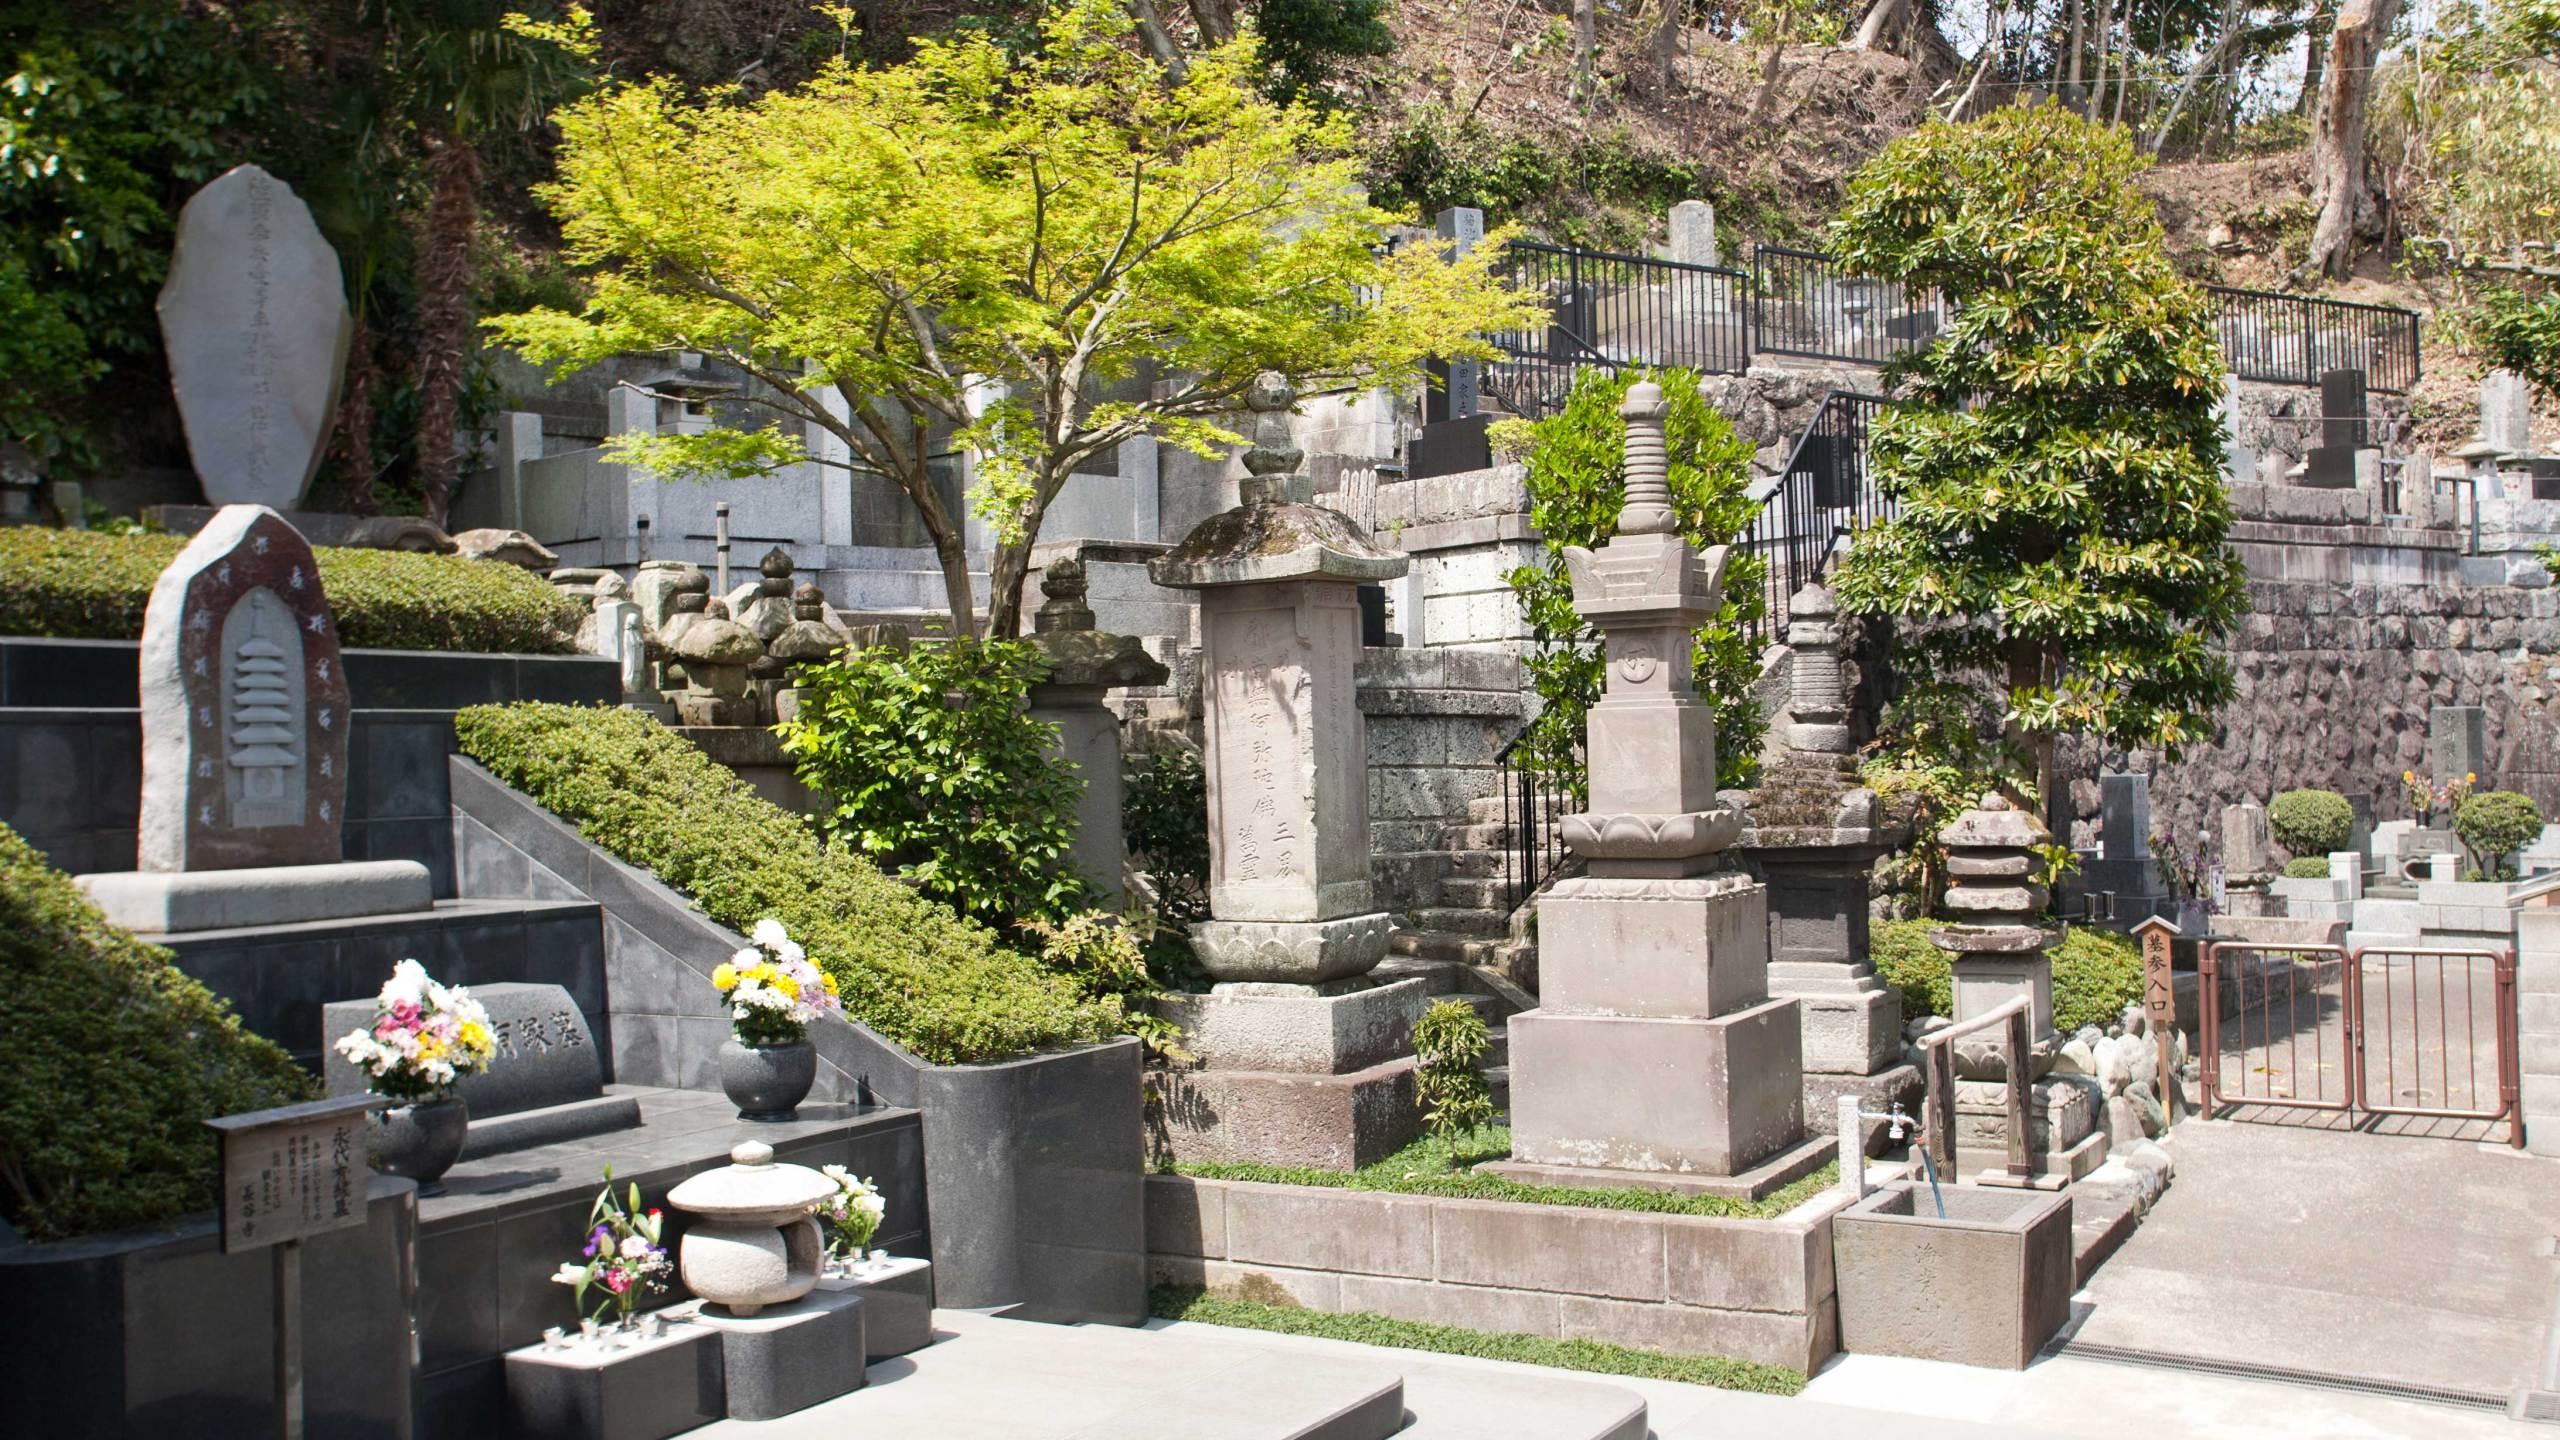 a-japanese-stones-monument_Bw7_lOnfl_1534539495284.jpg